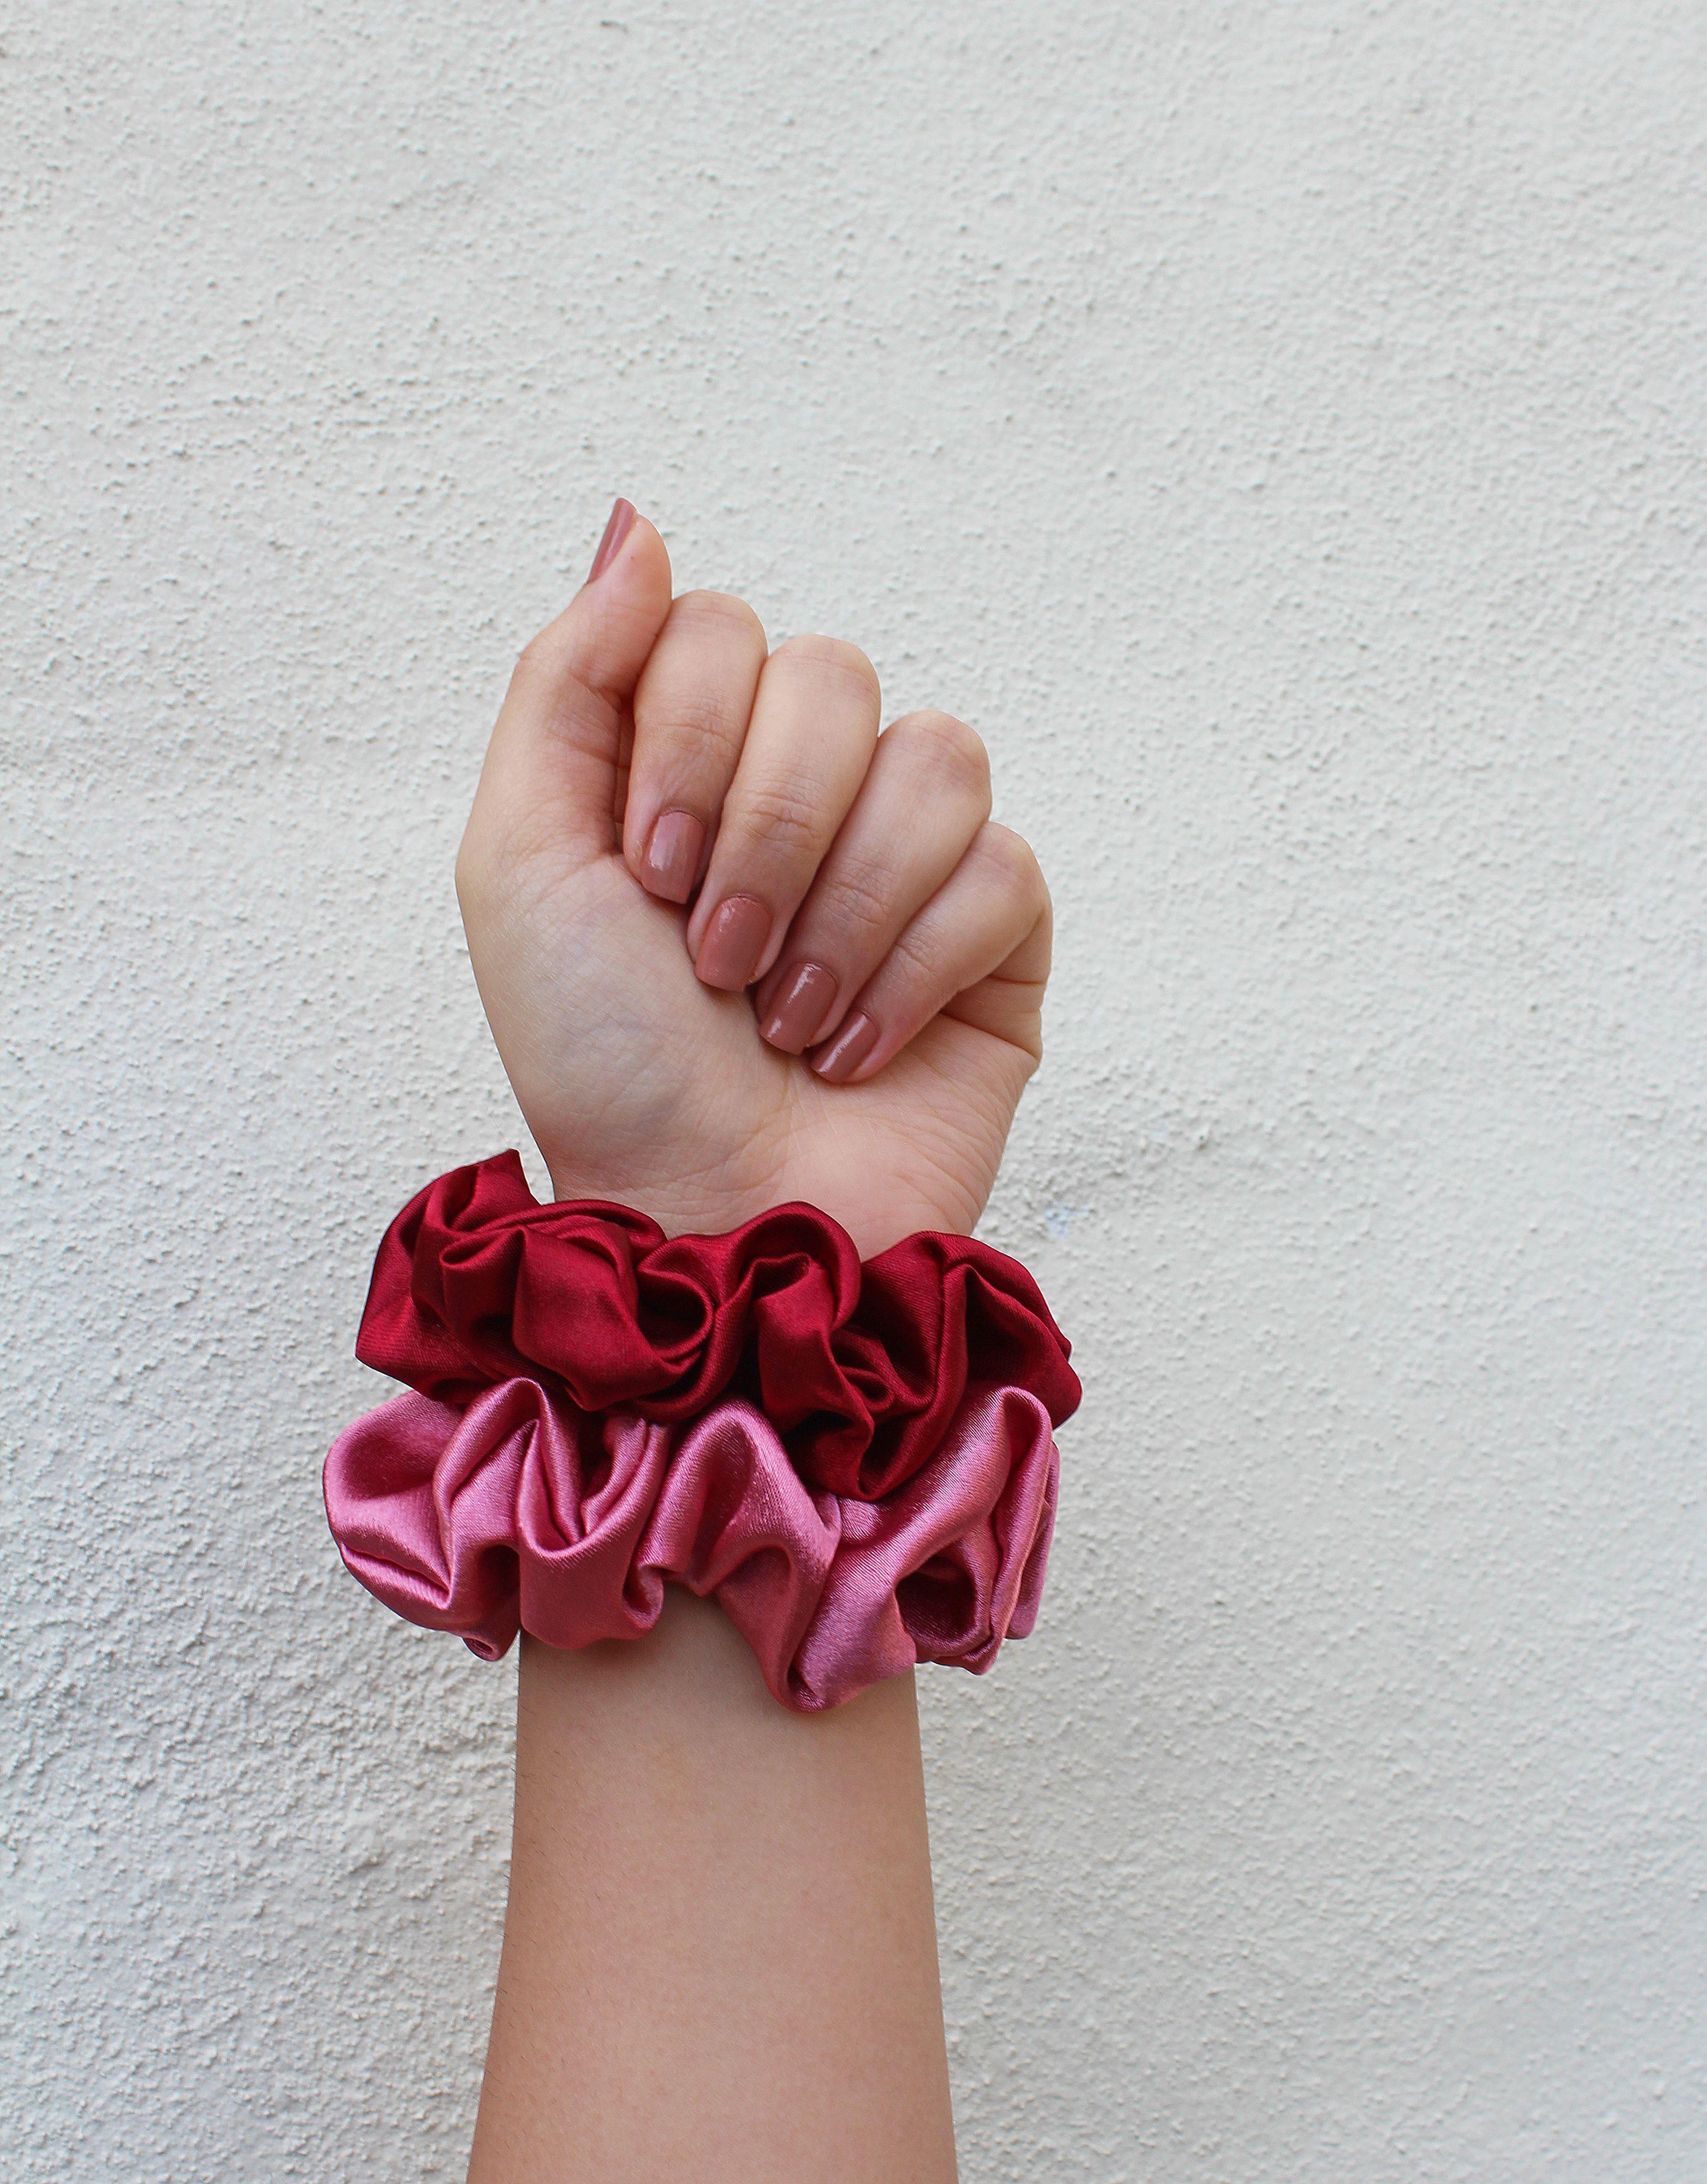 Valentine/'s Day Gift Cheap VALENTINE/'S DAY SCRUNCHIES Valentine/'s Day Scrunchies Valentine/'s Day Gift Ideas Handmade Satin Scrunchies